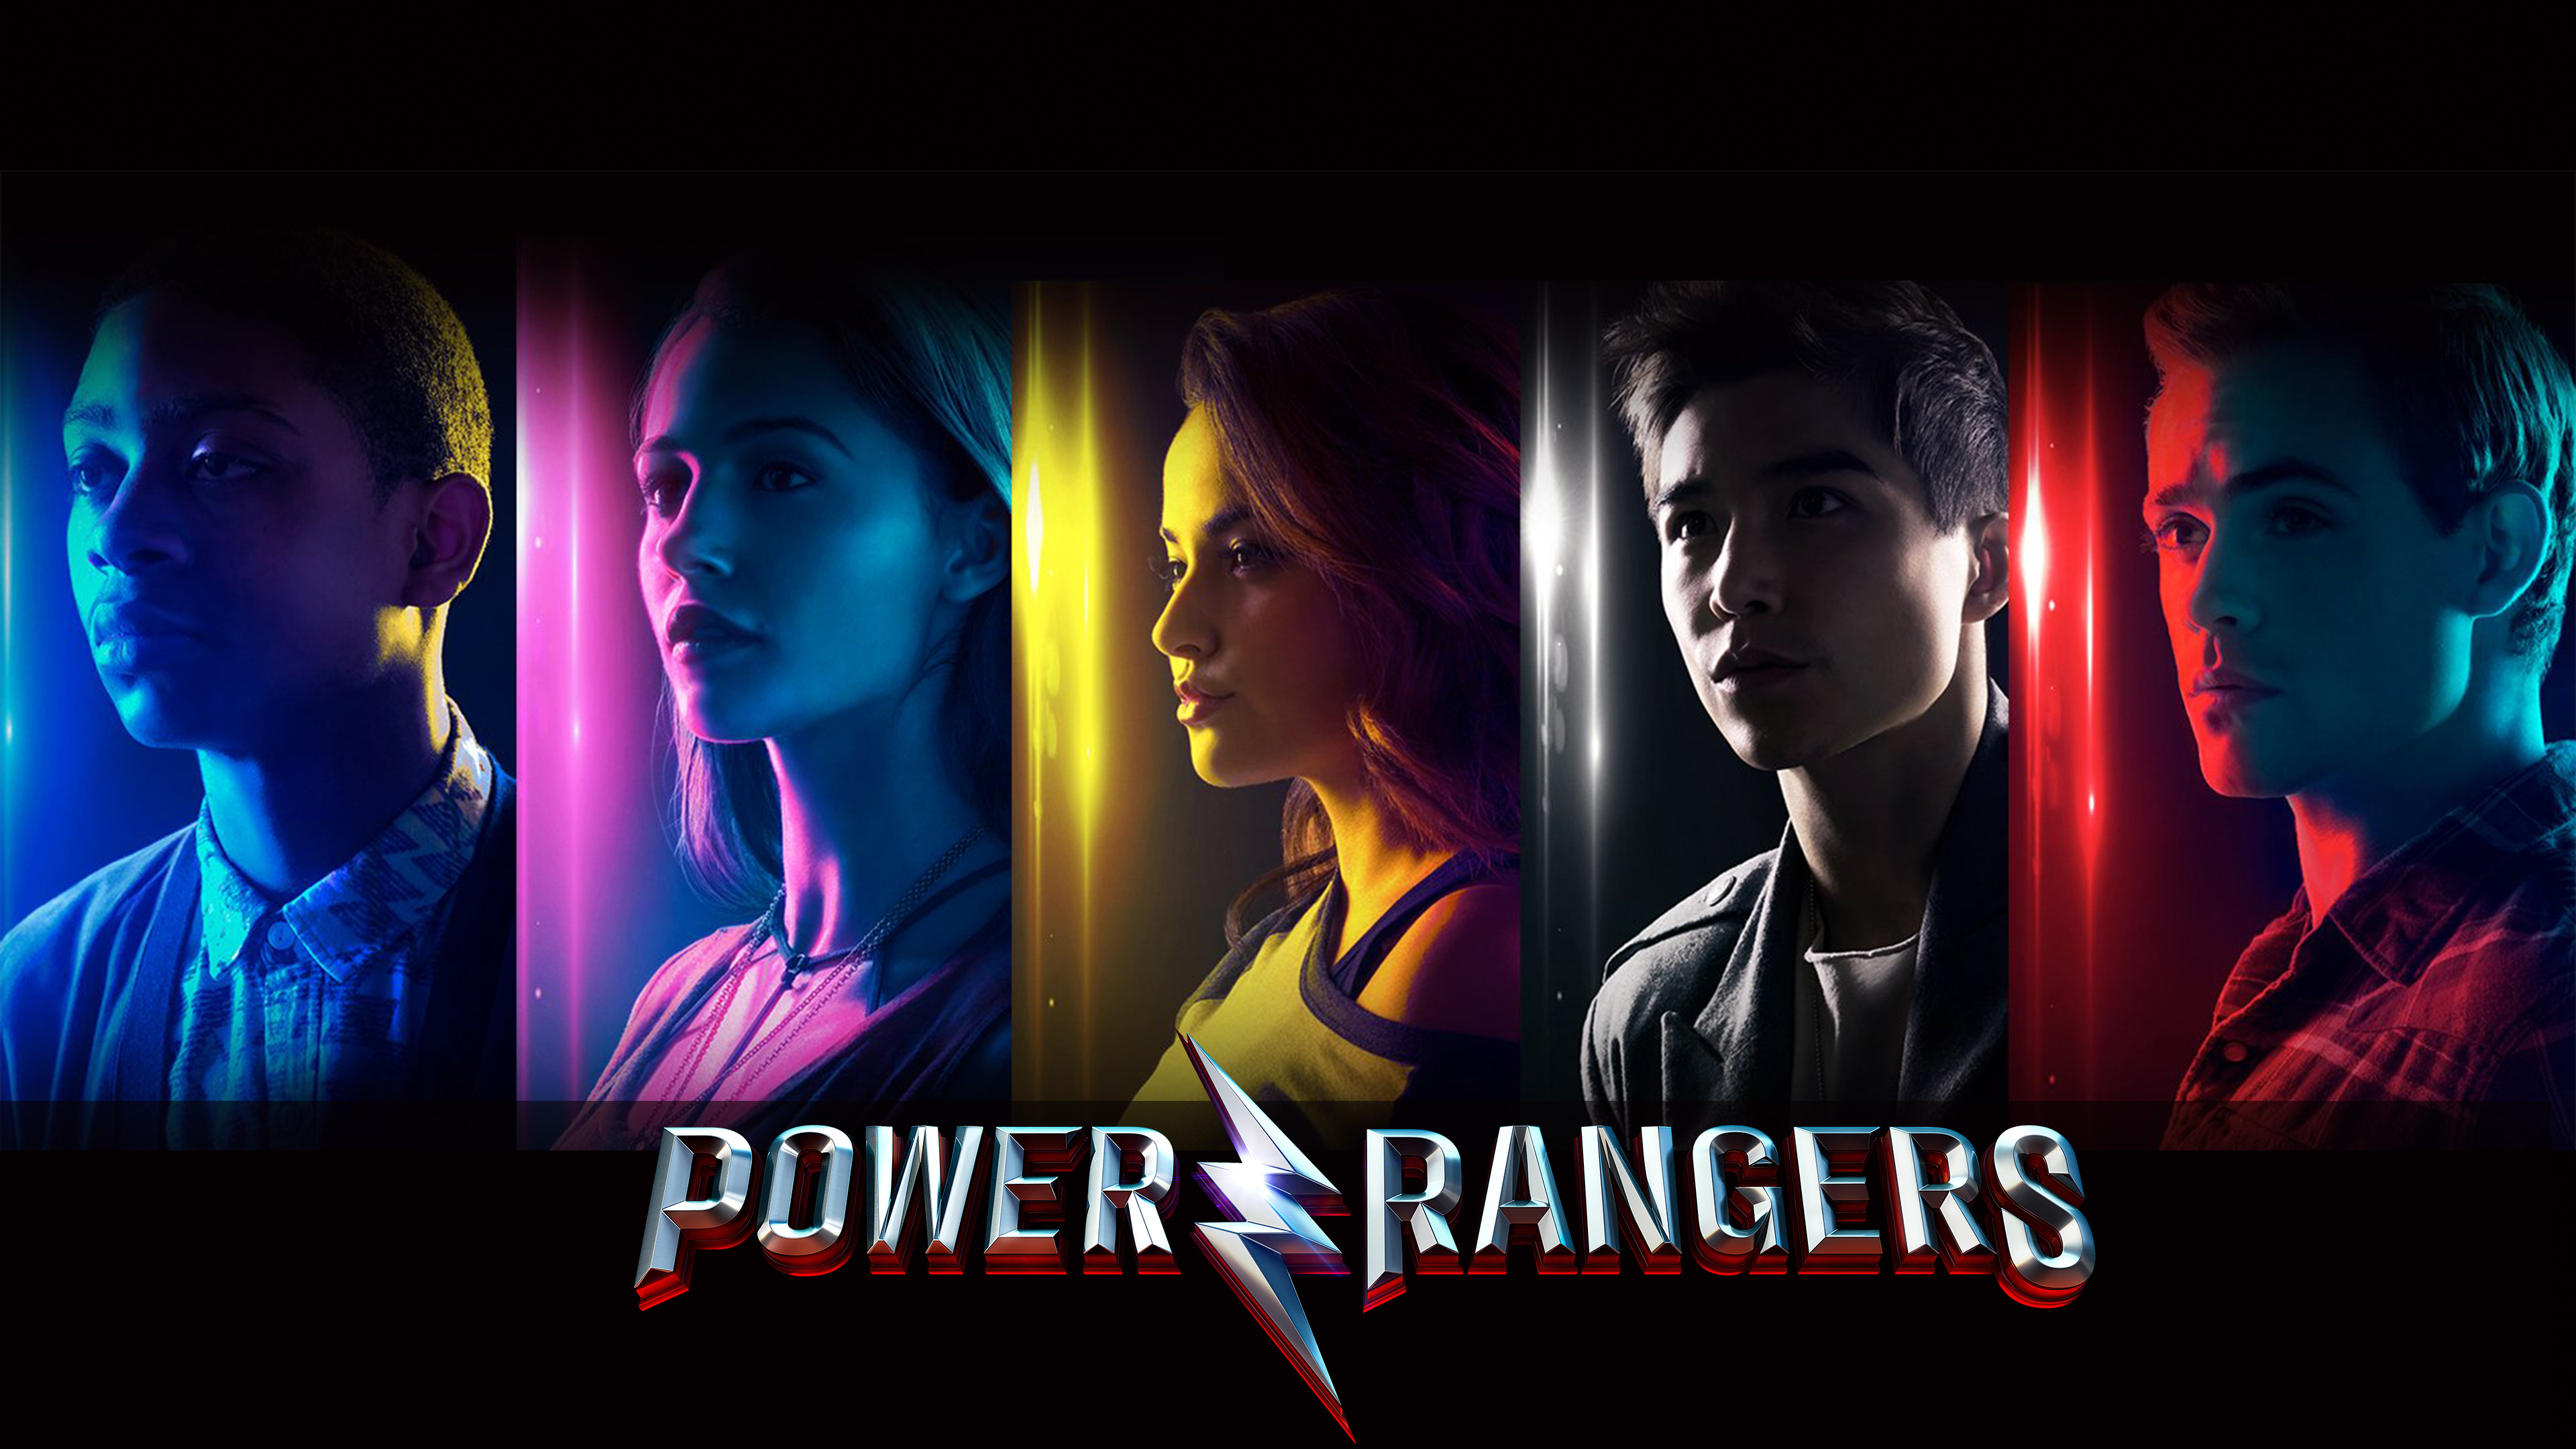 Wallpaper Poster of Power Rangers